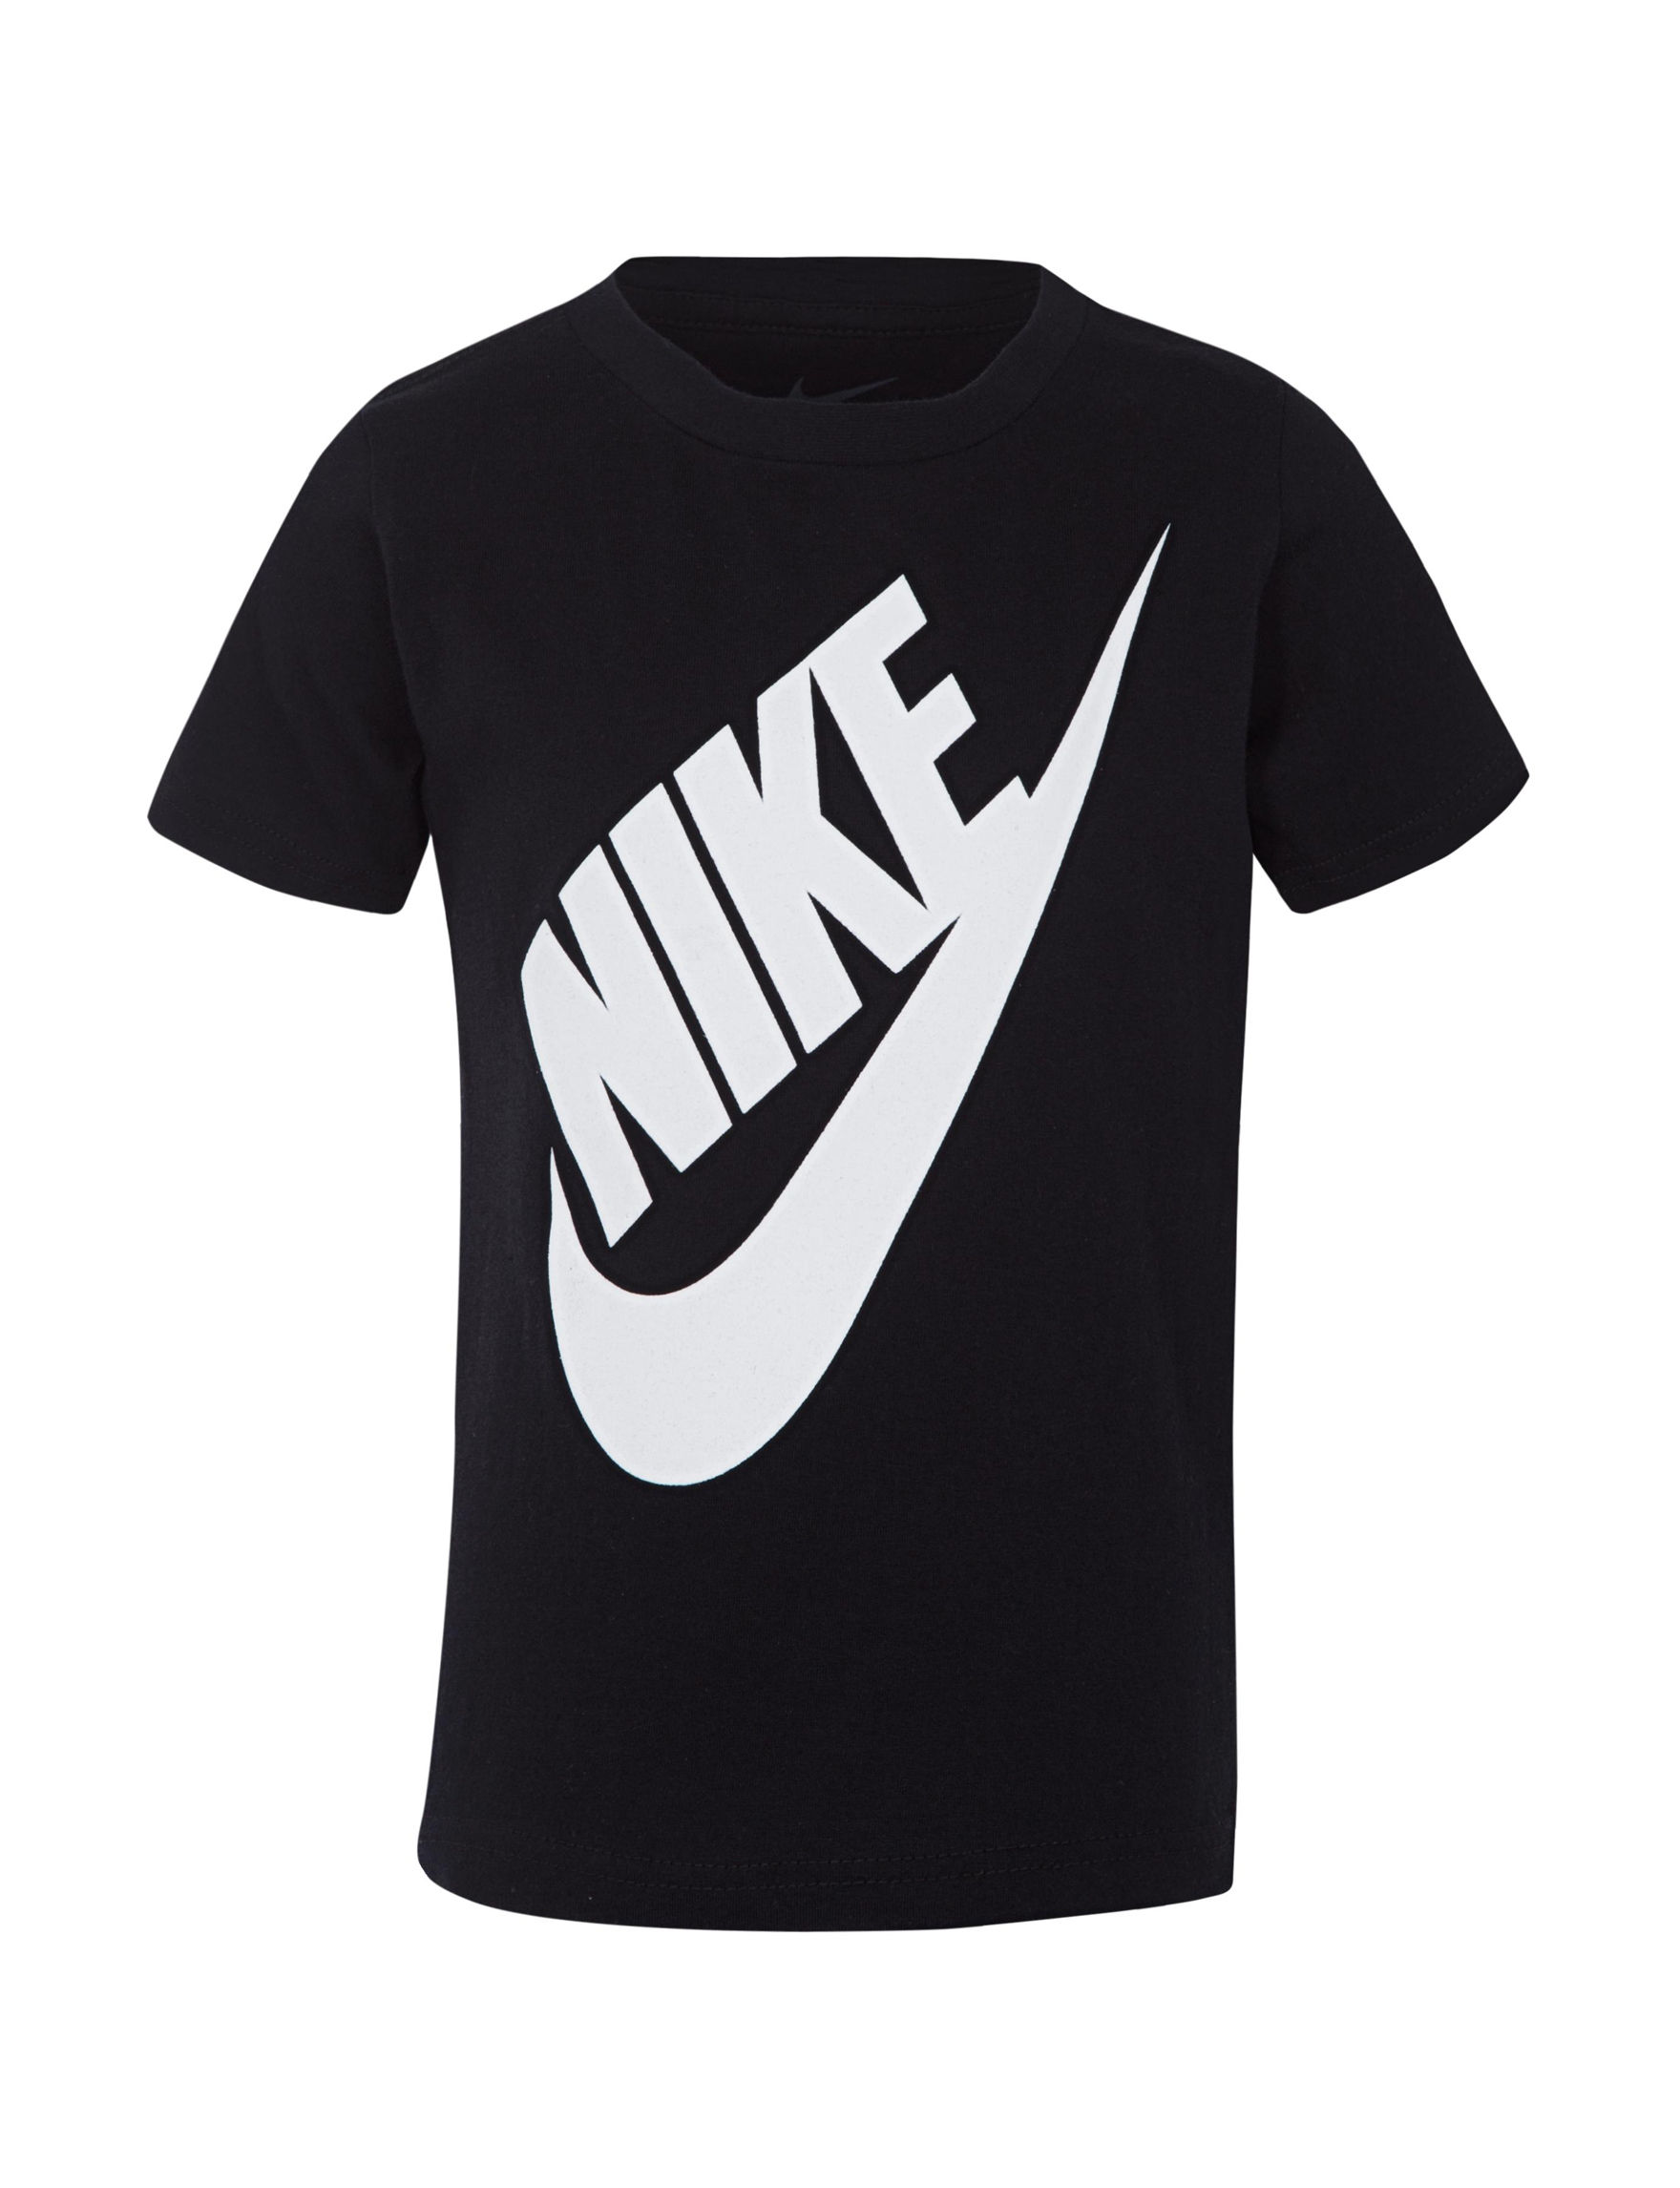 Nike Black / White Tees & Tanks